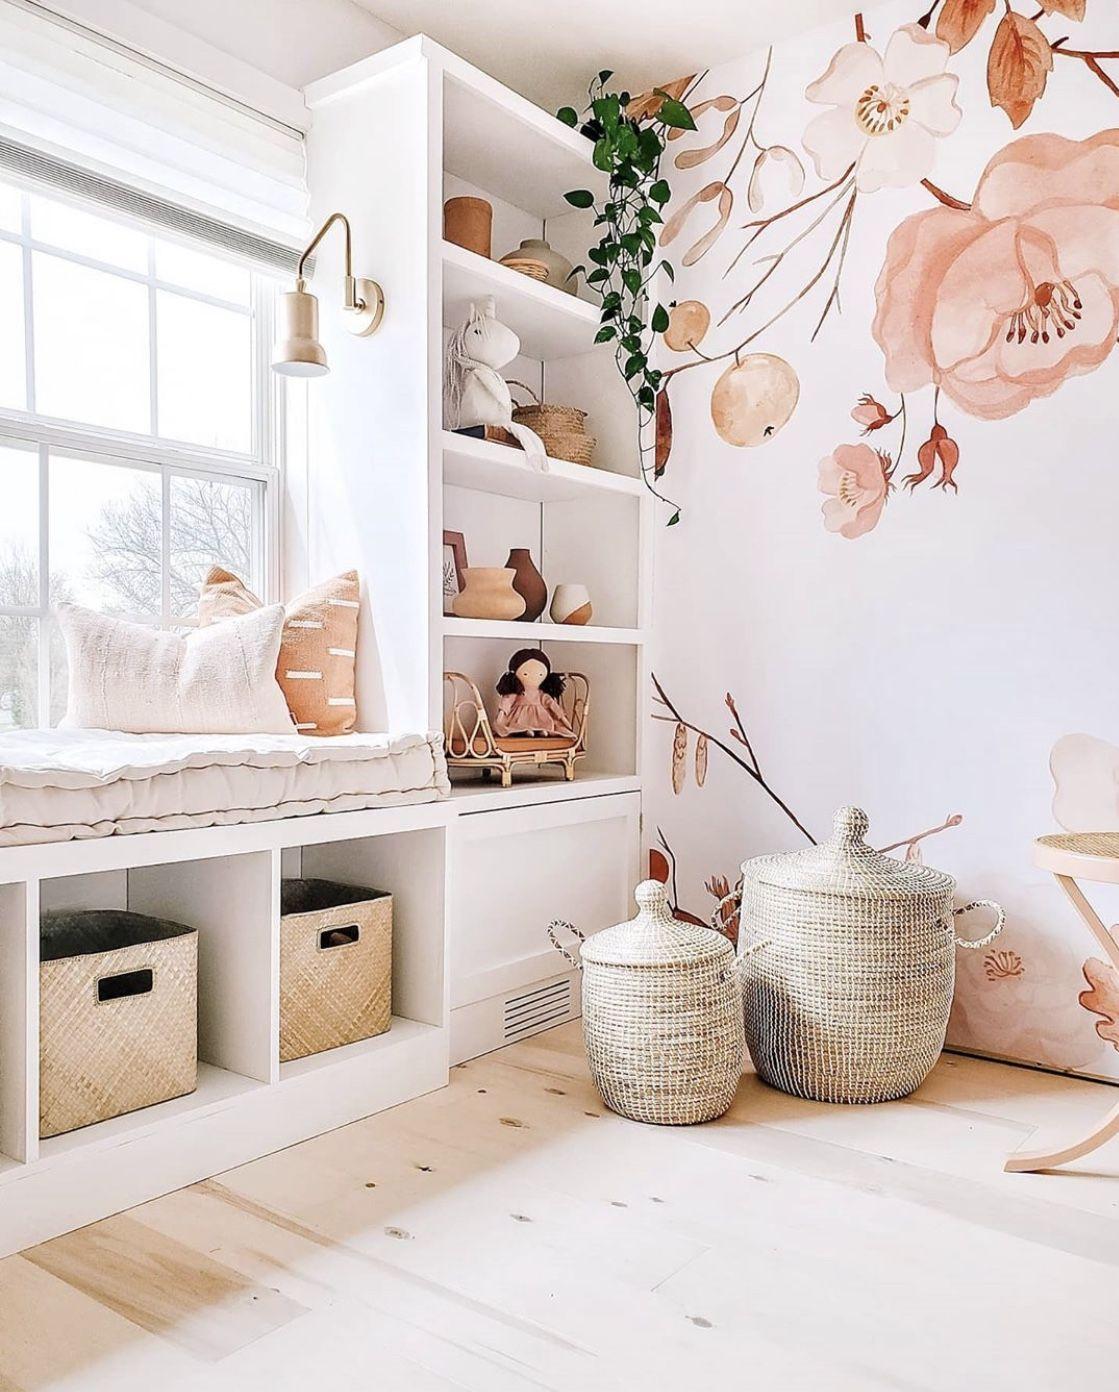 Whimsical Girls Bedroom with DIY Built In Shelves